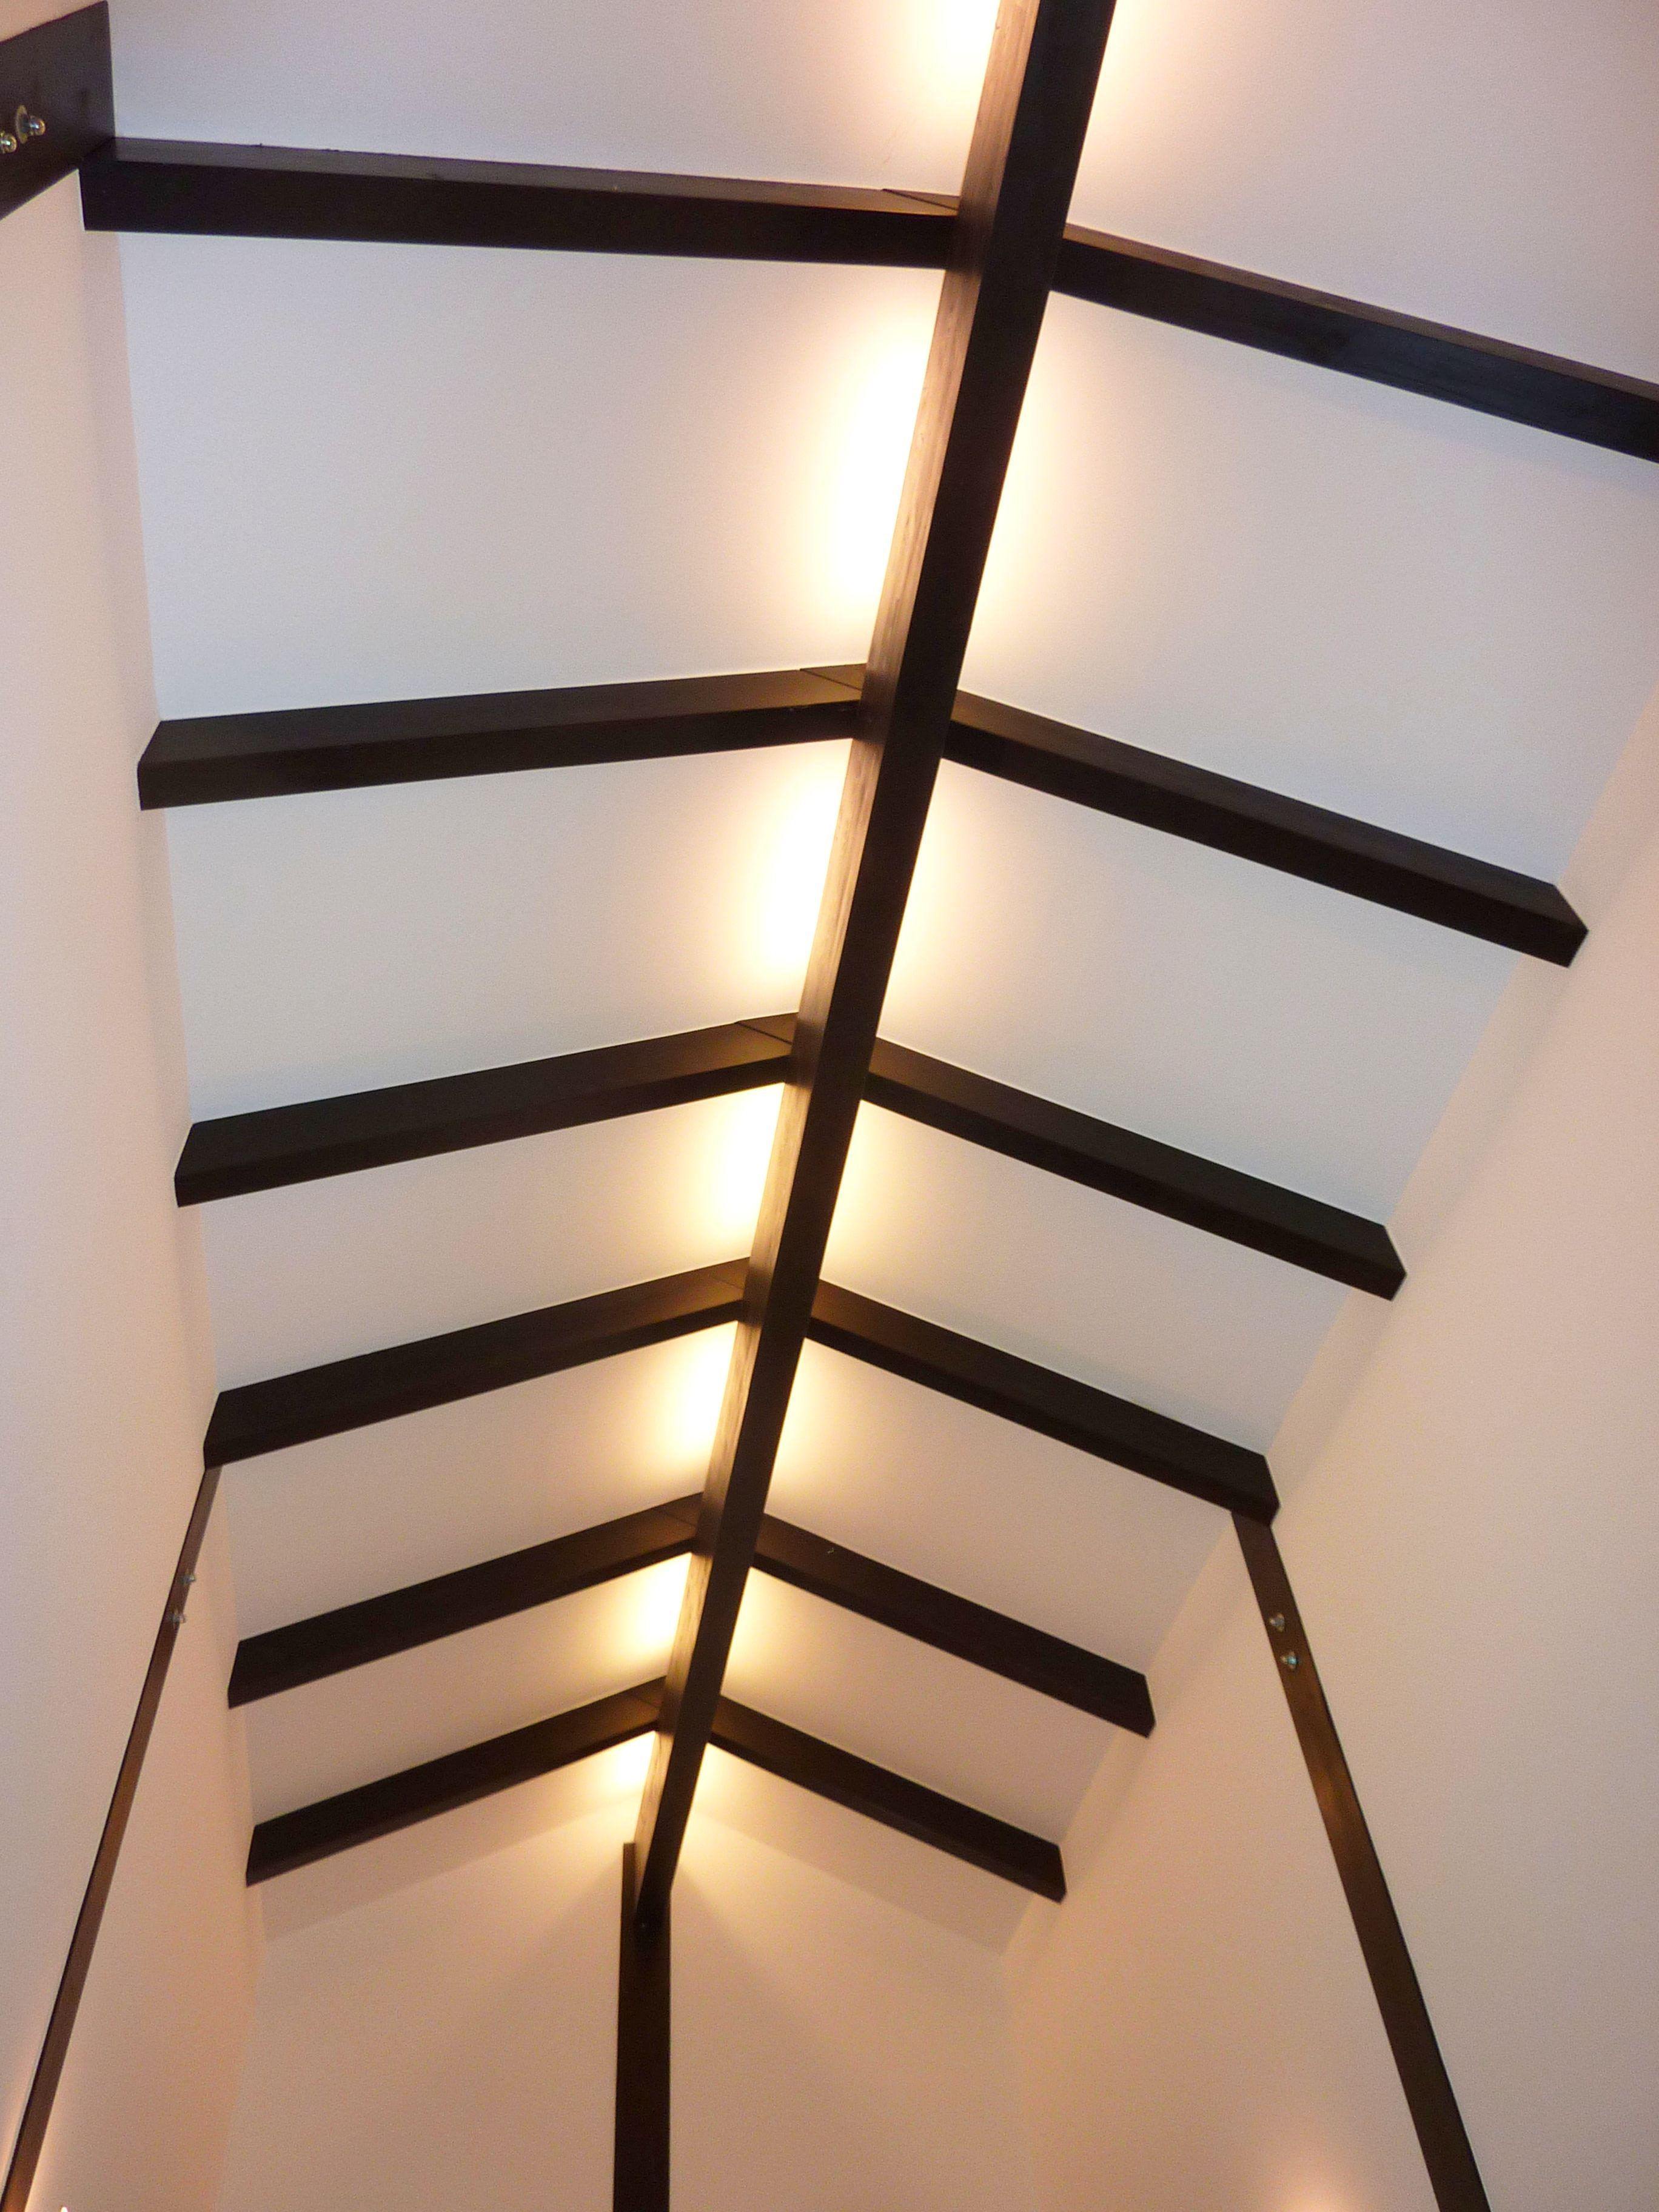 adelaparvu.com despre casa modulara pe sistem de barne, arhitectura Soleta (32)